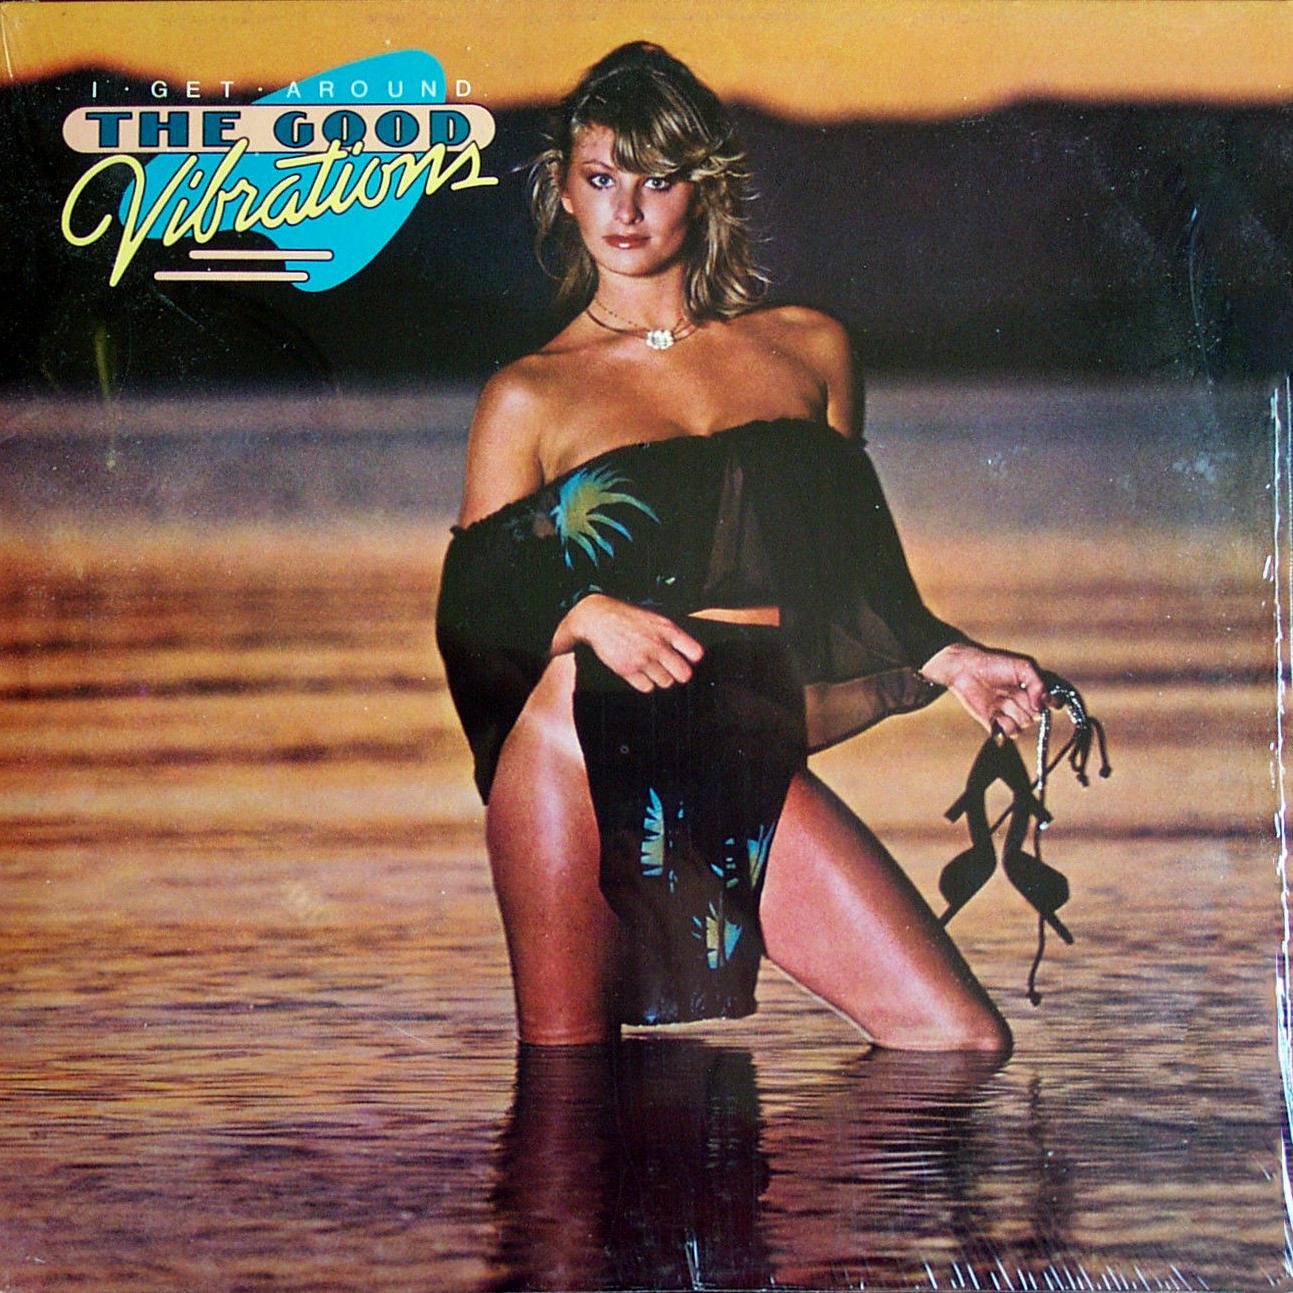 I-Get-Around.-The-Good-Vibrations.-1978